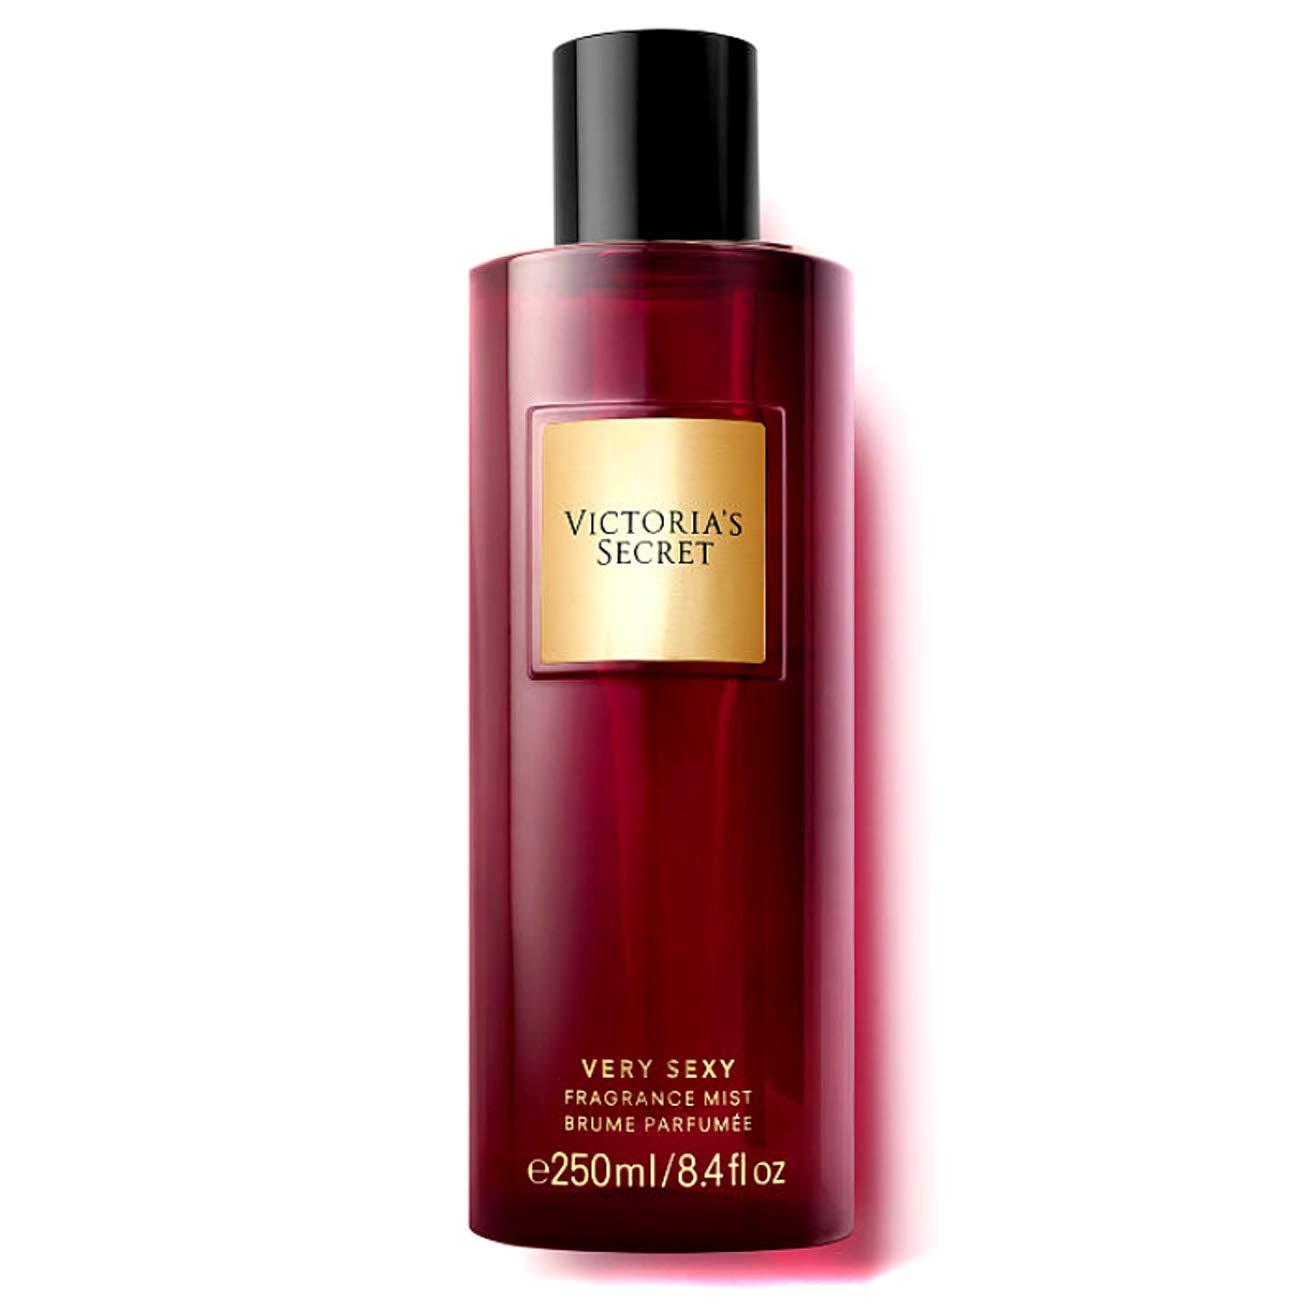 Victoria's Secret Very Sexy Body Mist Fragrance, 8.4 oz / 250 ml